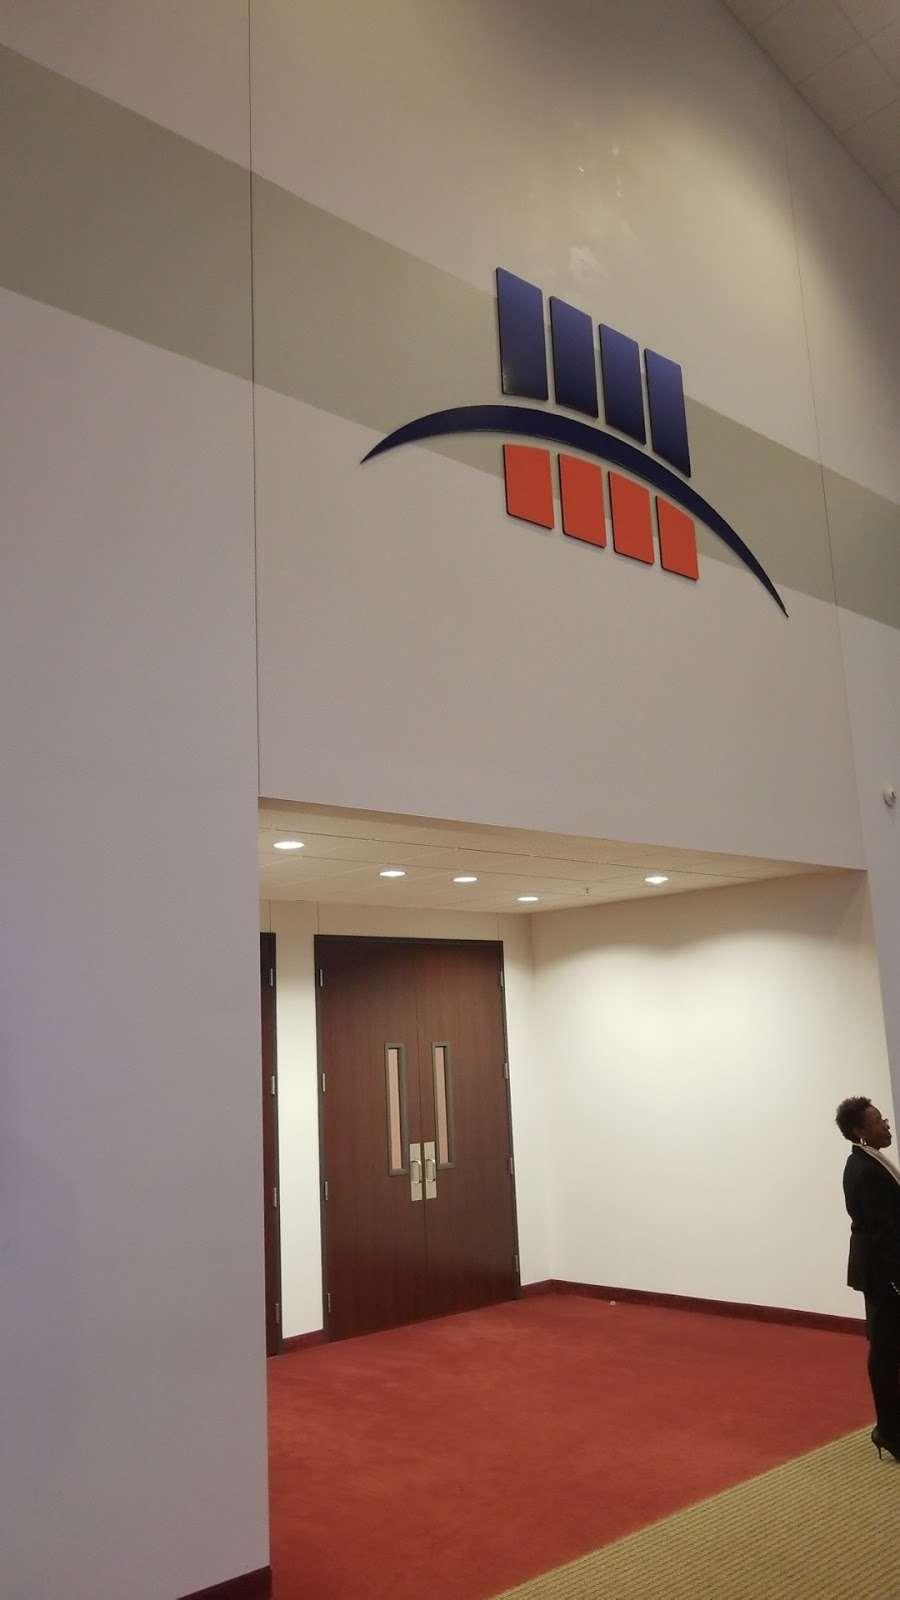 The Luke Church - church  | Photo 7 of 10 | Address: 2380 S Houston Ave, Humble, TX 77396, USA | Phone: (281) 548-2001